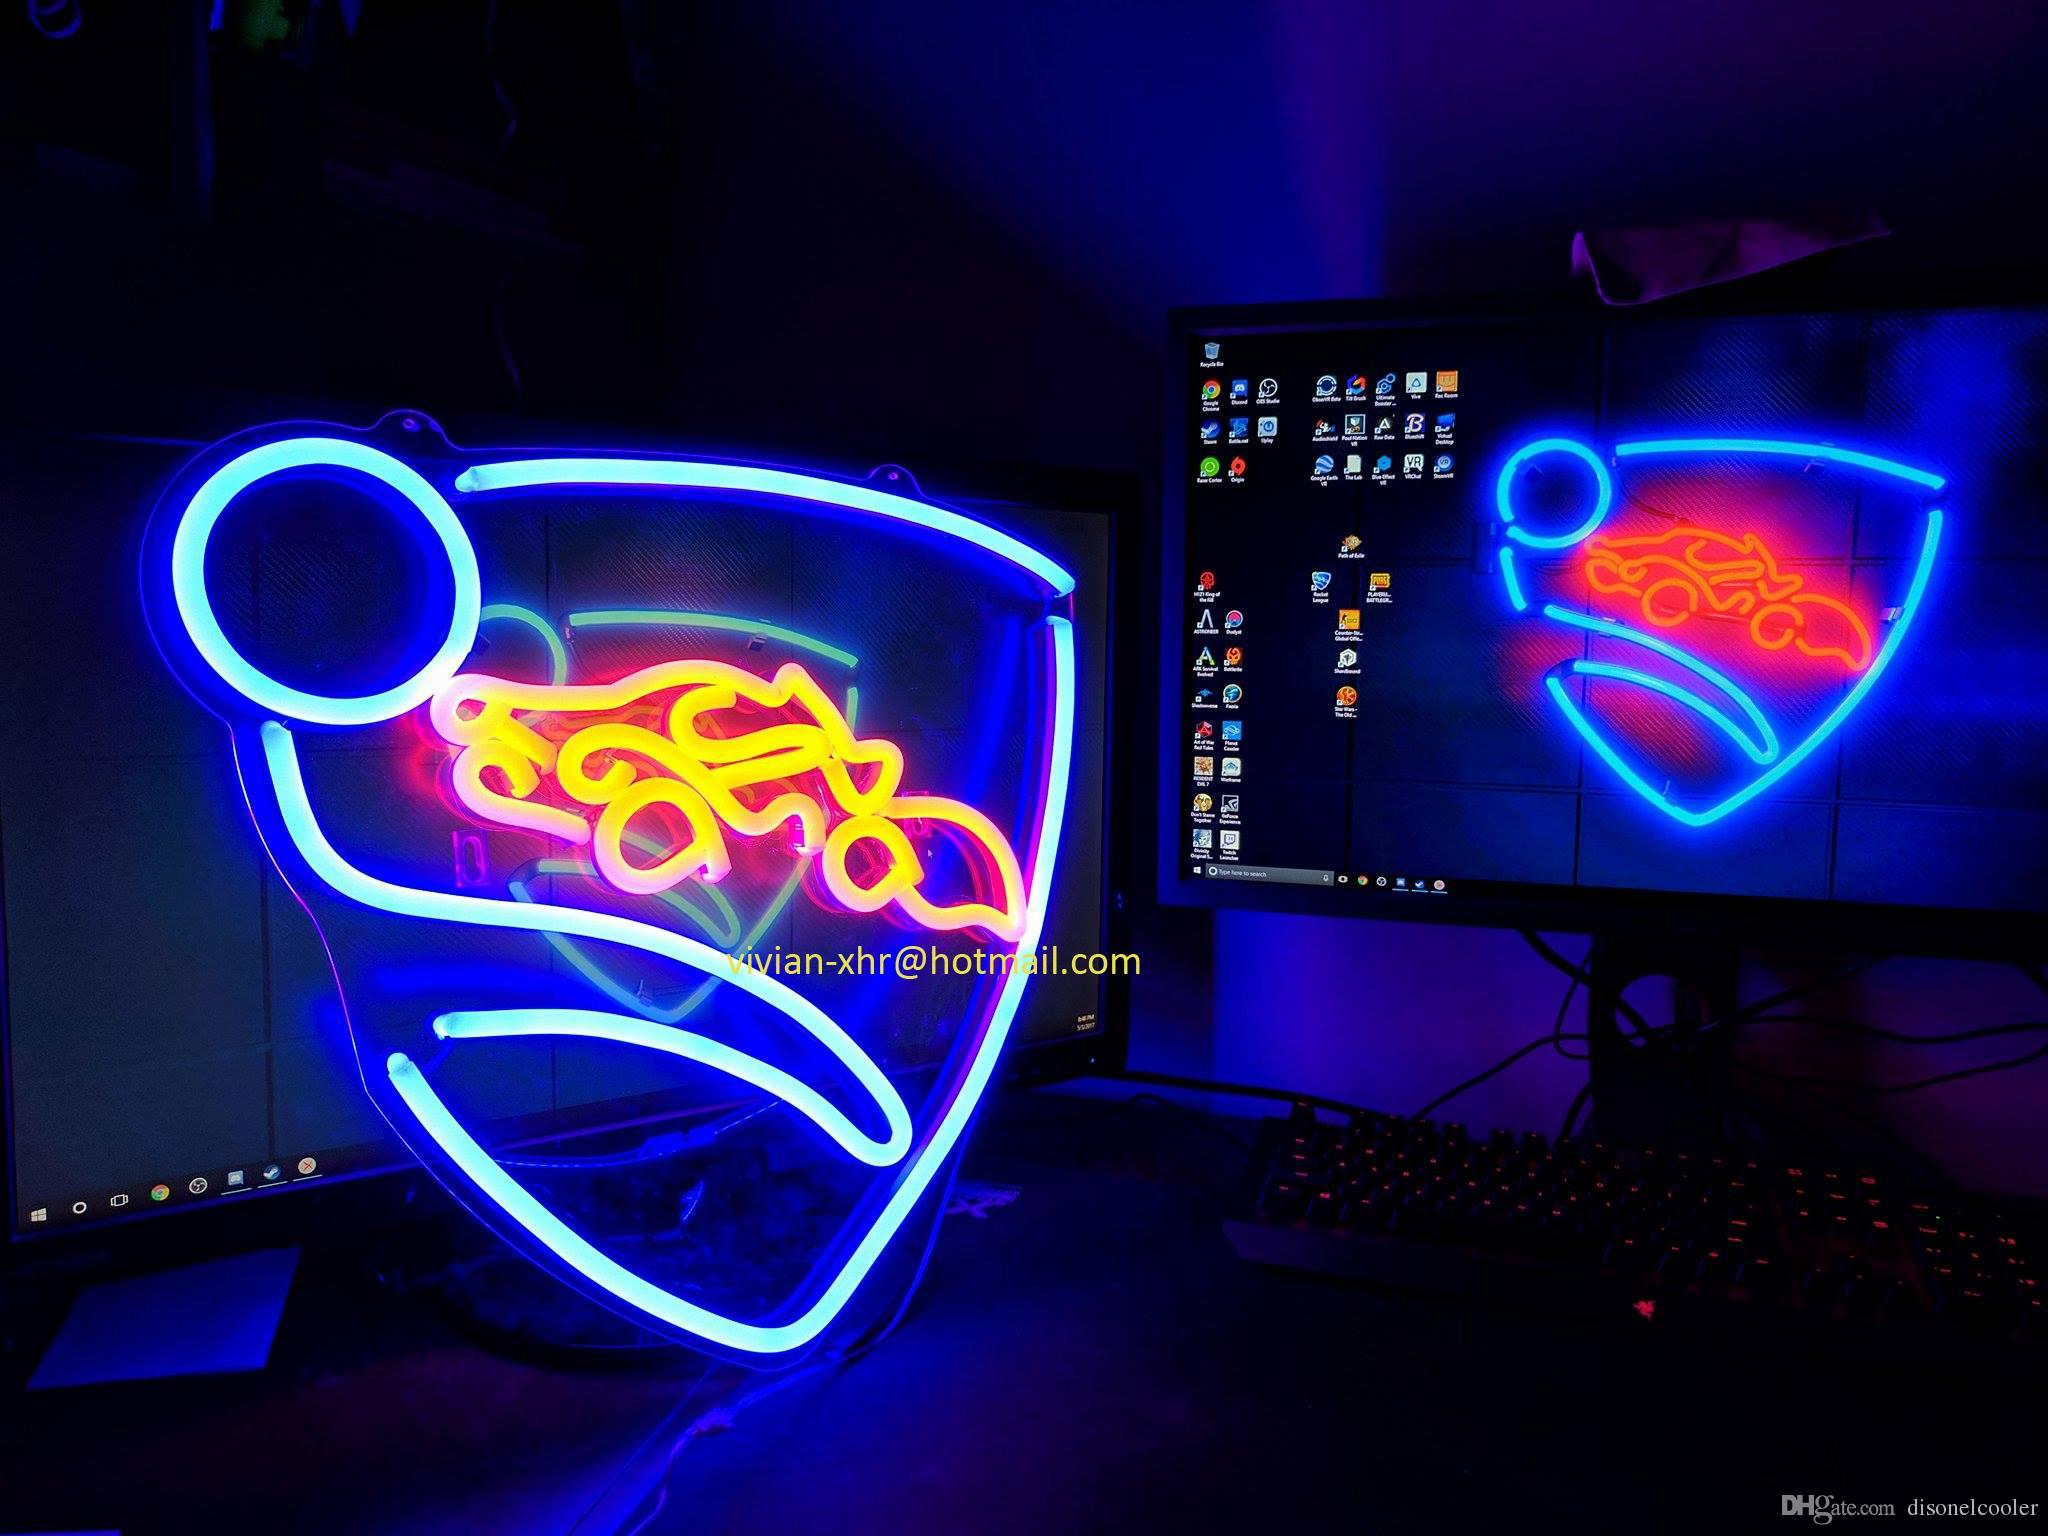 Cheap LED Flex Portable Custom Neon Lighting Sign Rocket League Logo Big Neon Glow Lamp Tube Sign Strip for Rooms